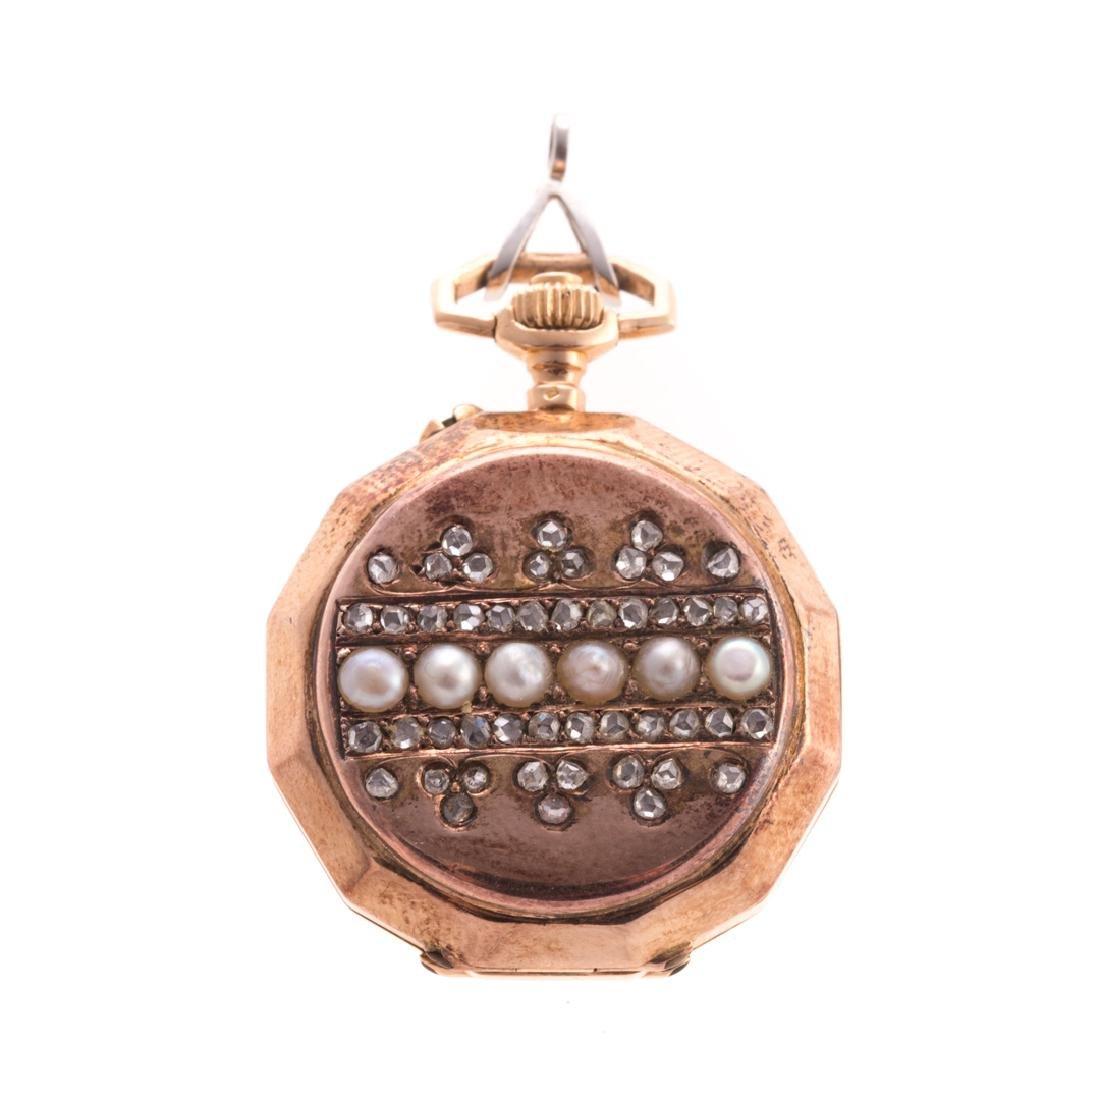 A Lady's Diamond & Seed Pearl Pendant Watch